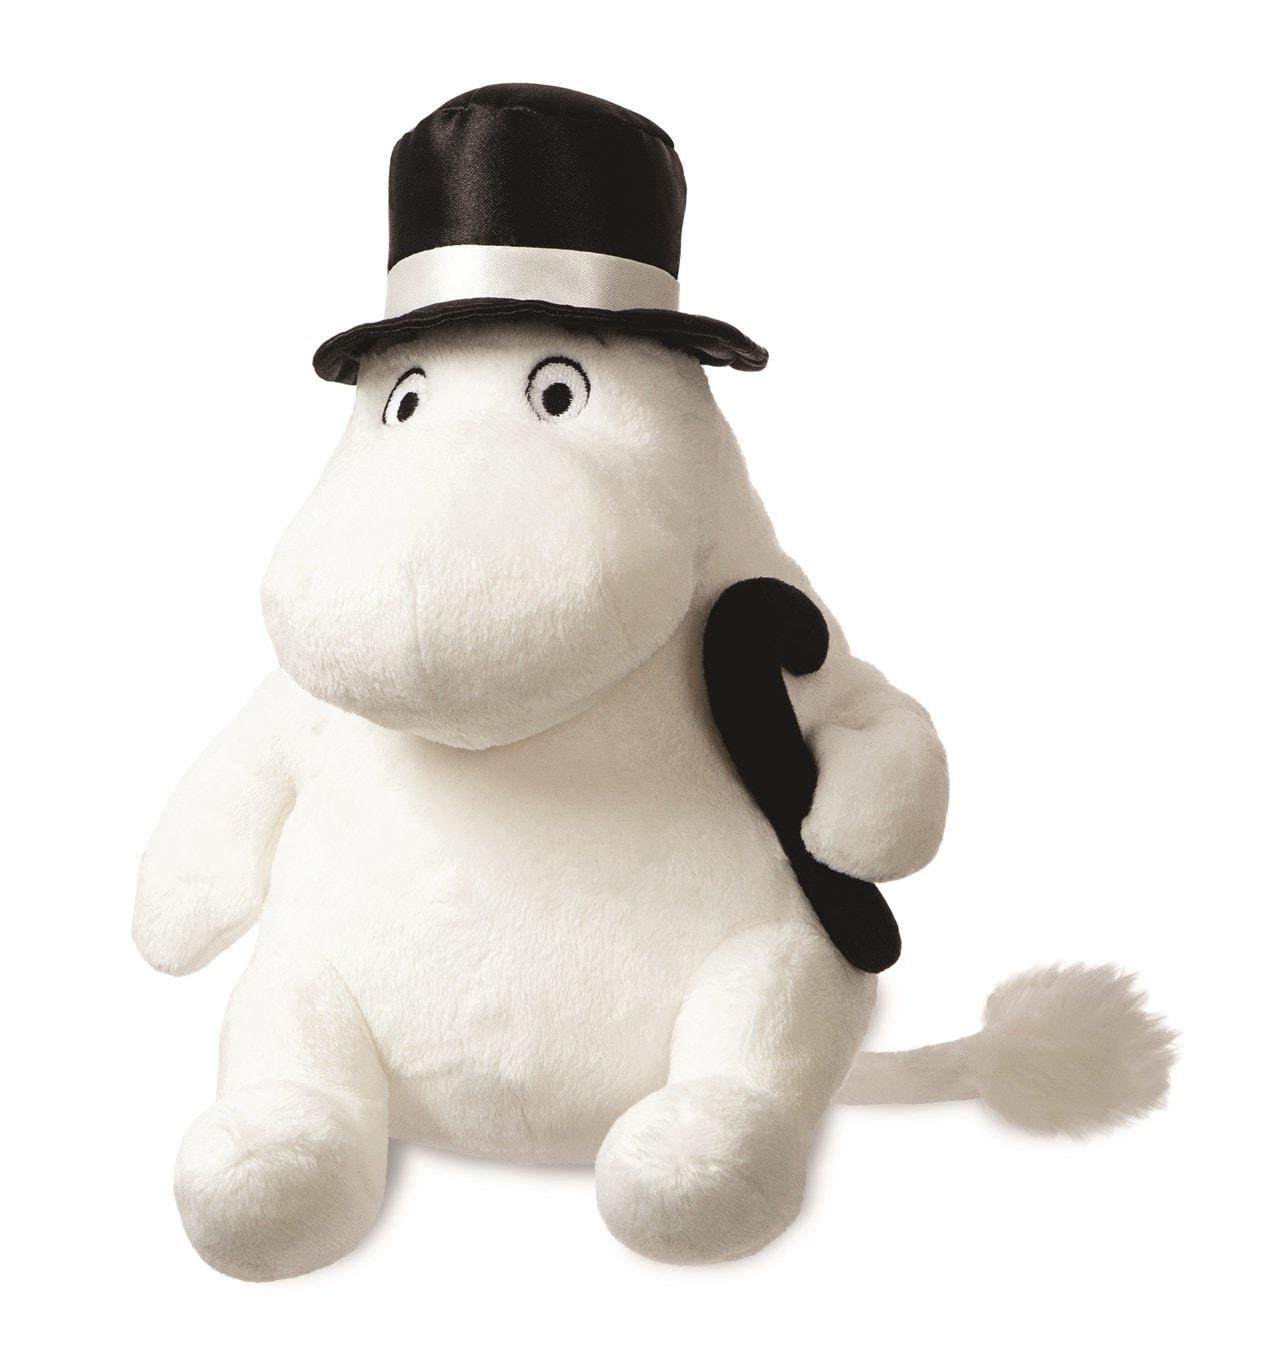 "Moominpappa: Moomin Plush 8"" - 1"